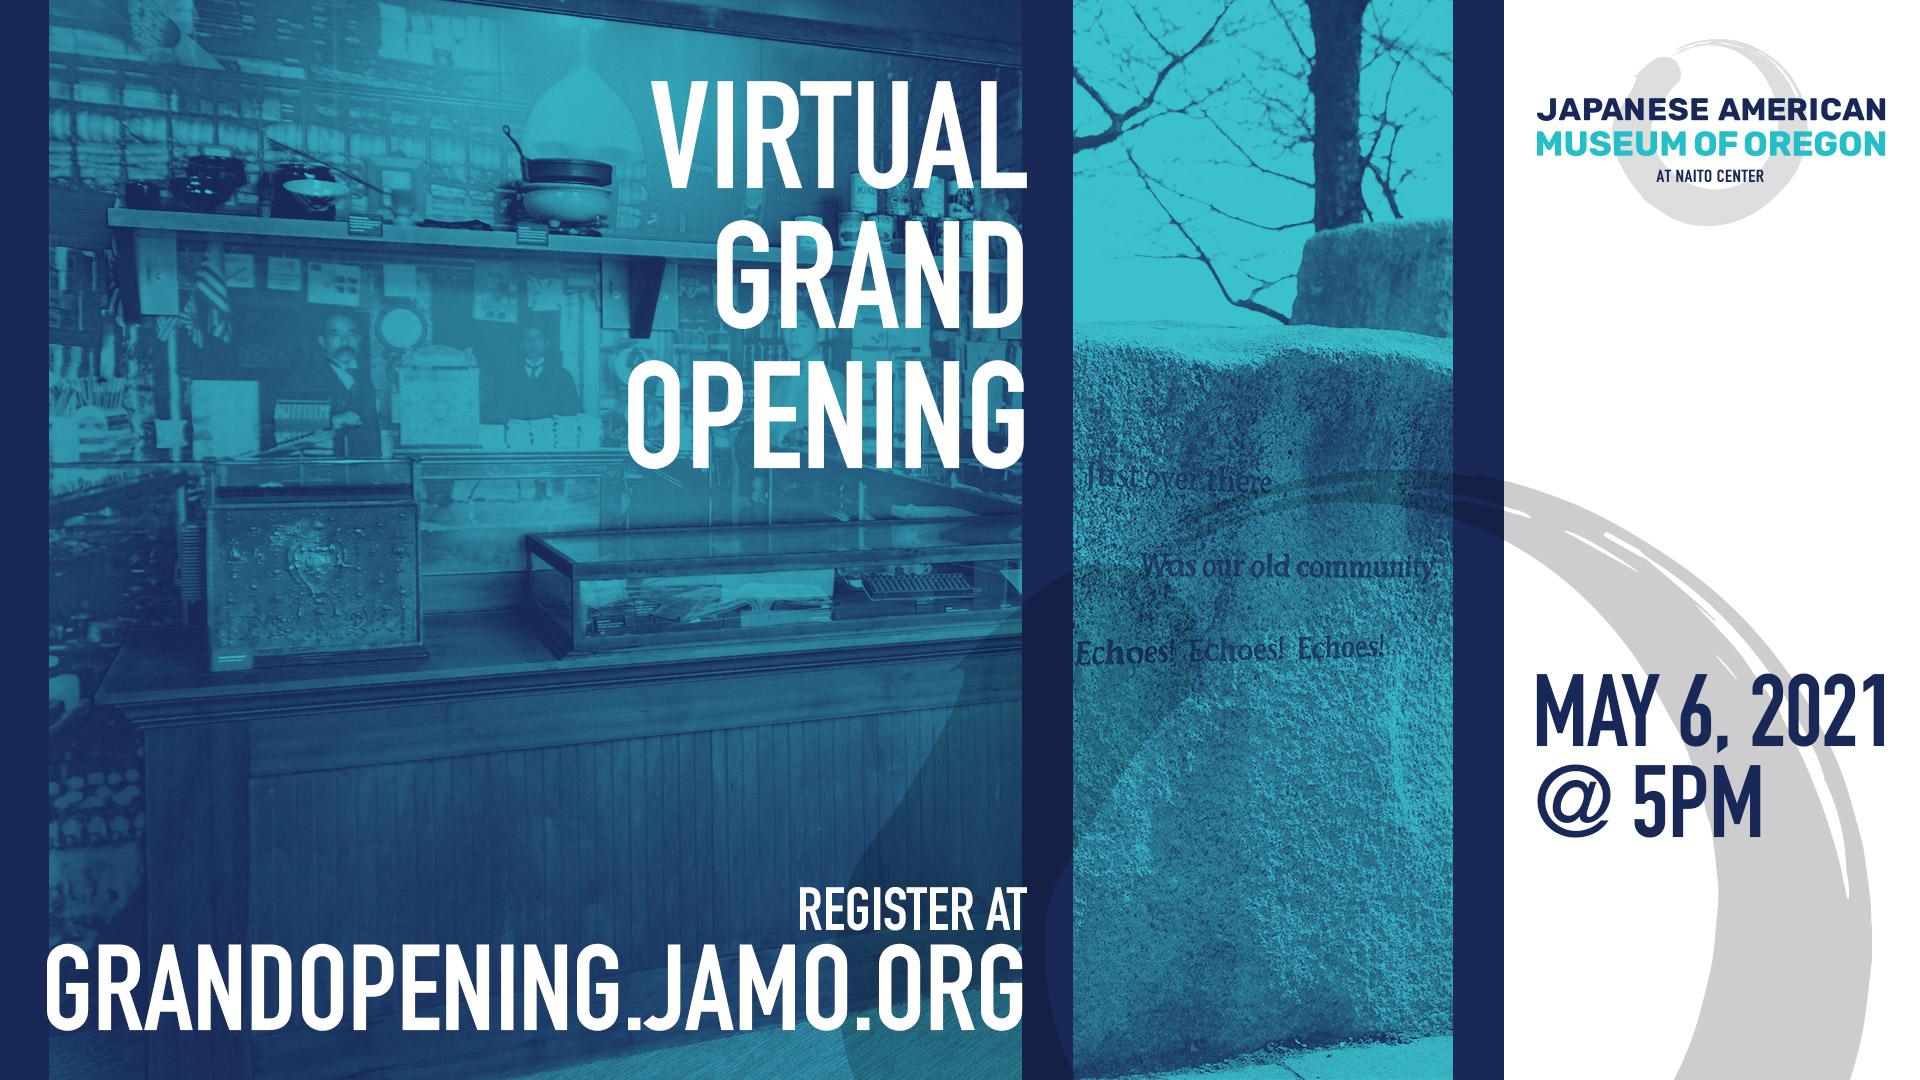 JAMO_virtual_grand_opening_FB_graphic.jpg